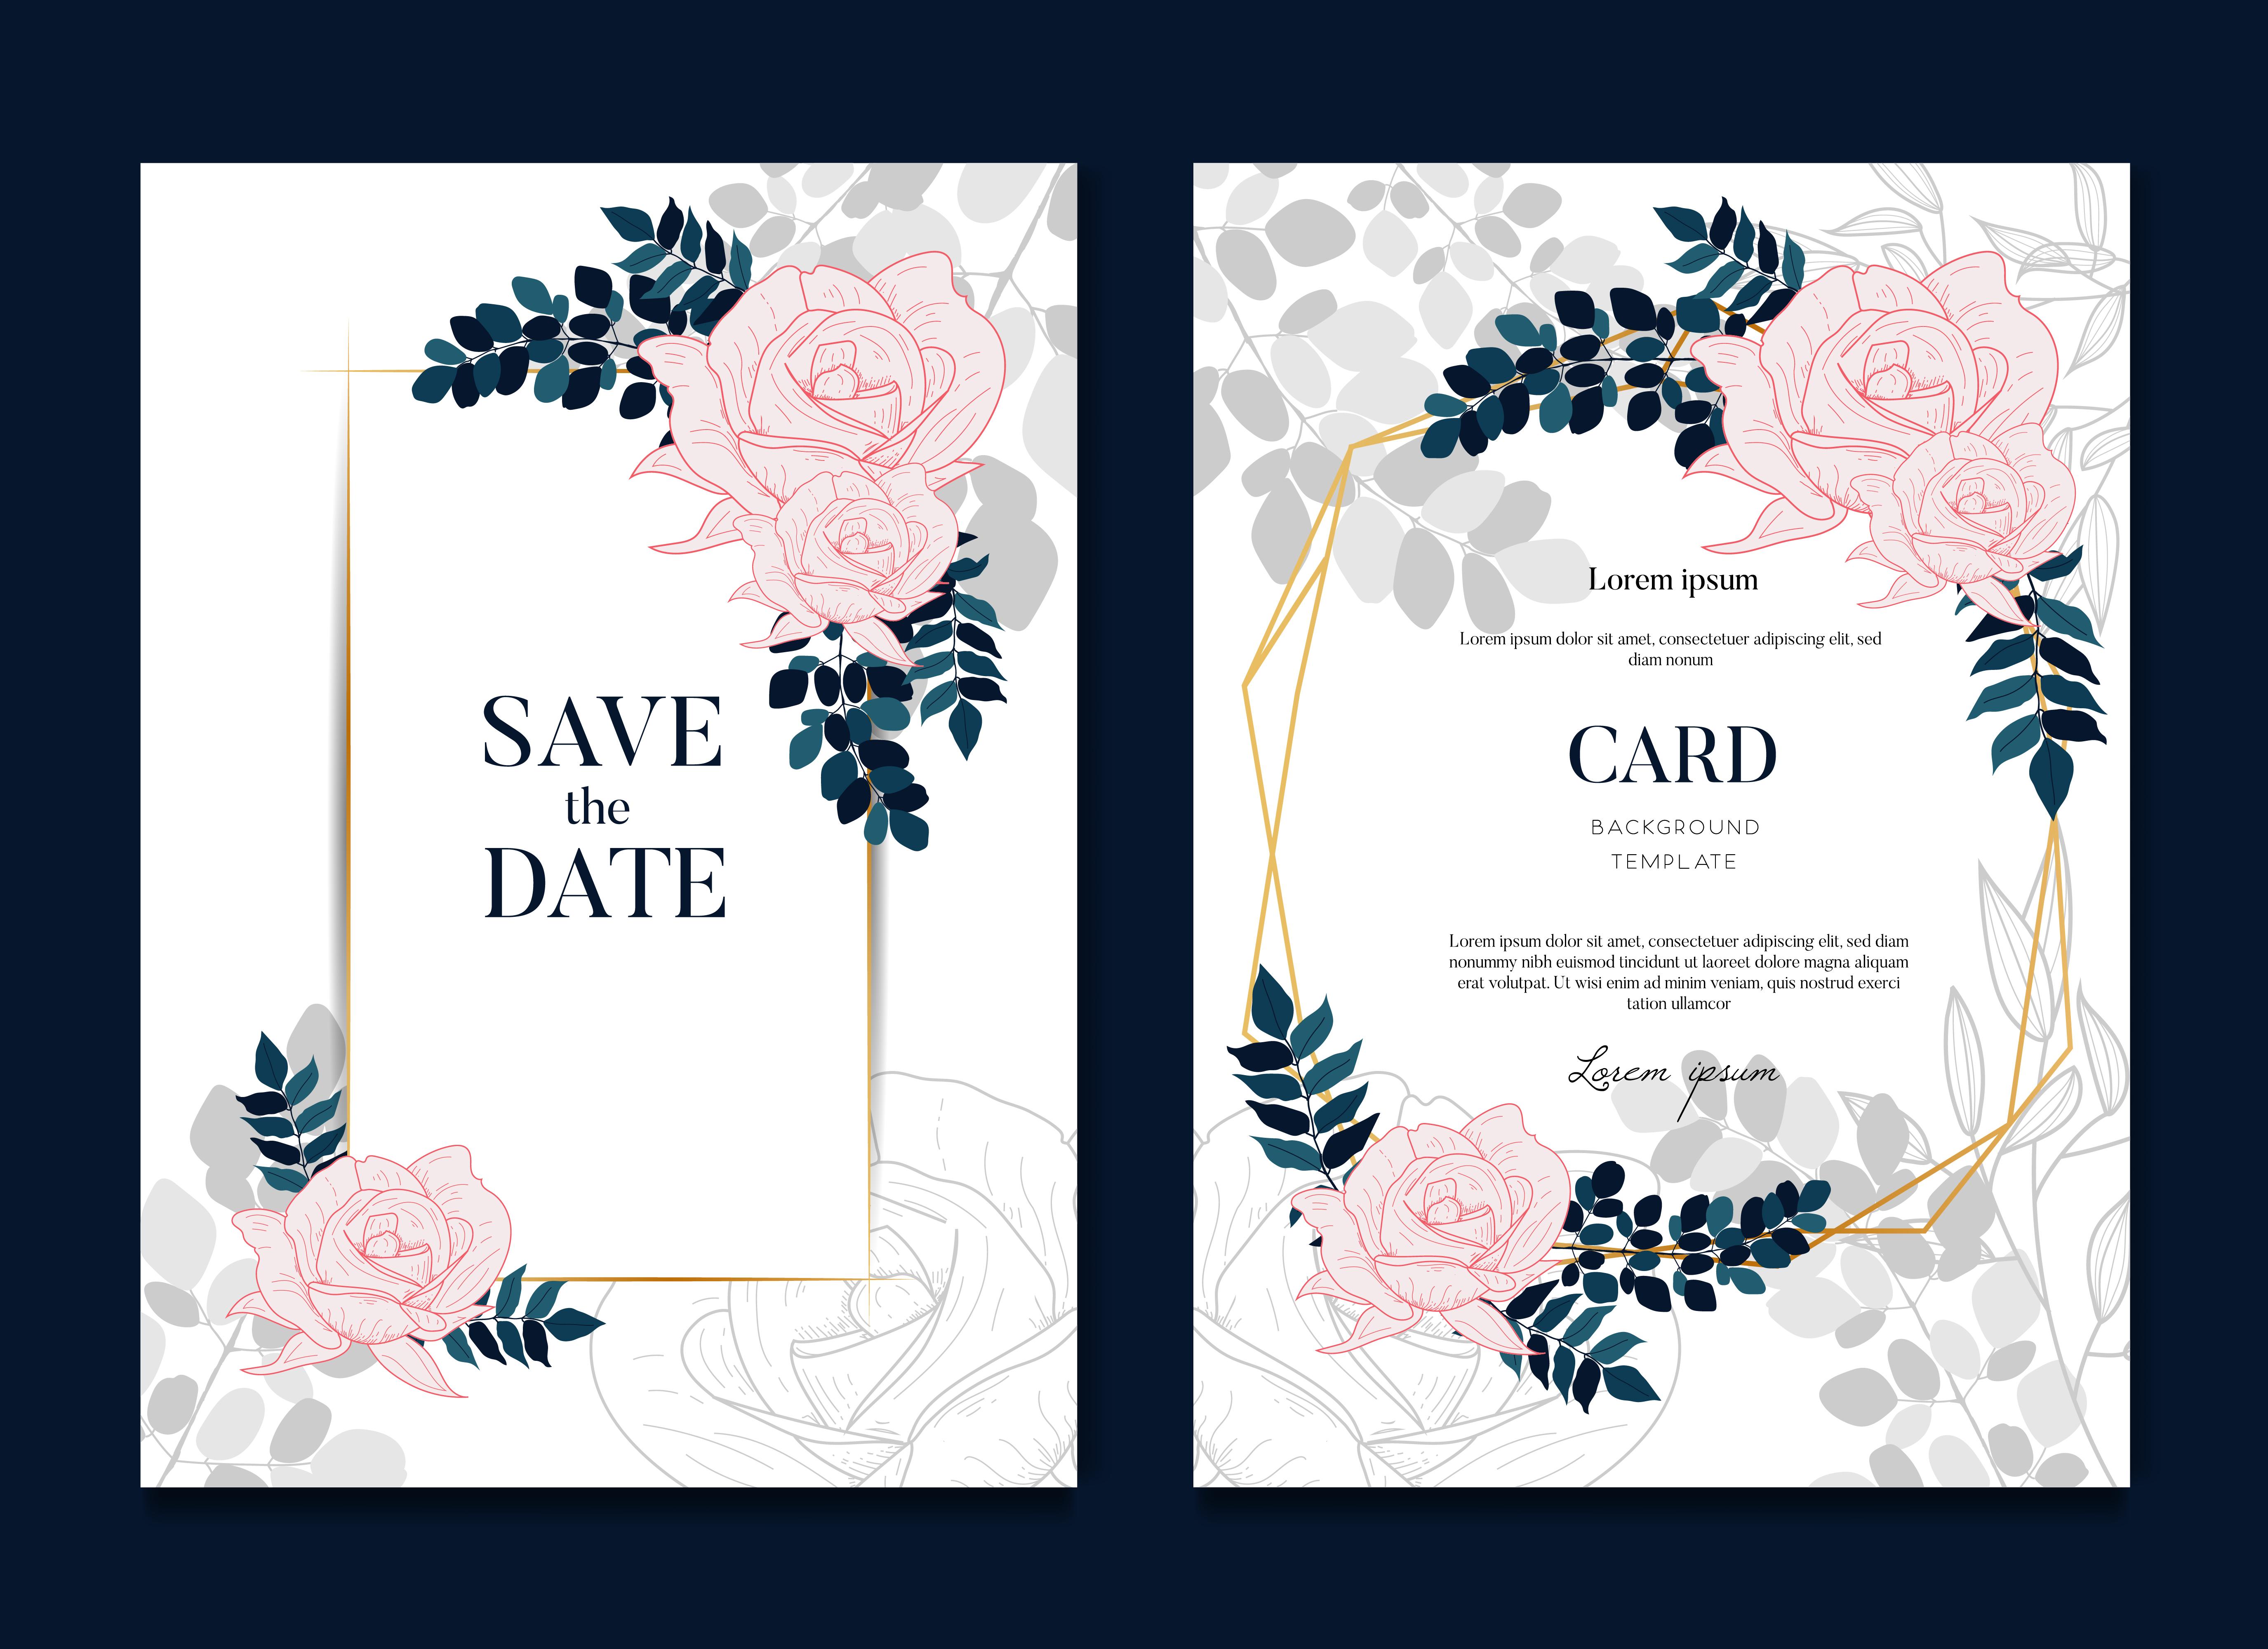 Simple Elegant Rose Wedding Frames Card And Invitation 602746 Download Free Vectors Clipart Graphics Vector Art